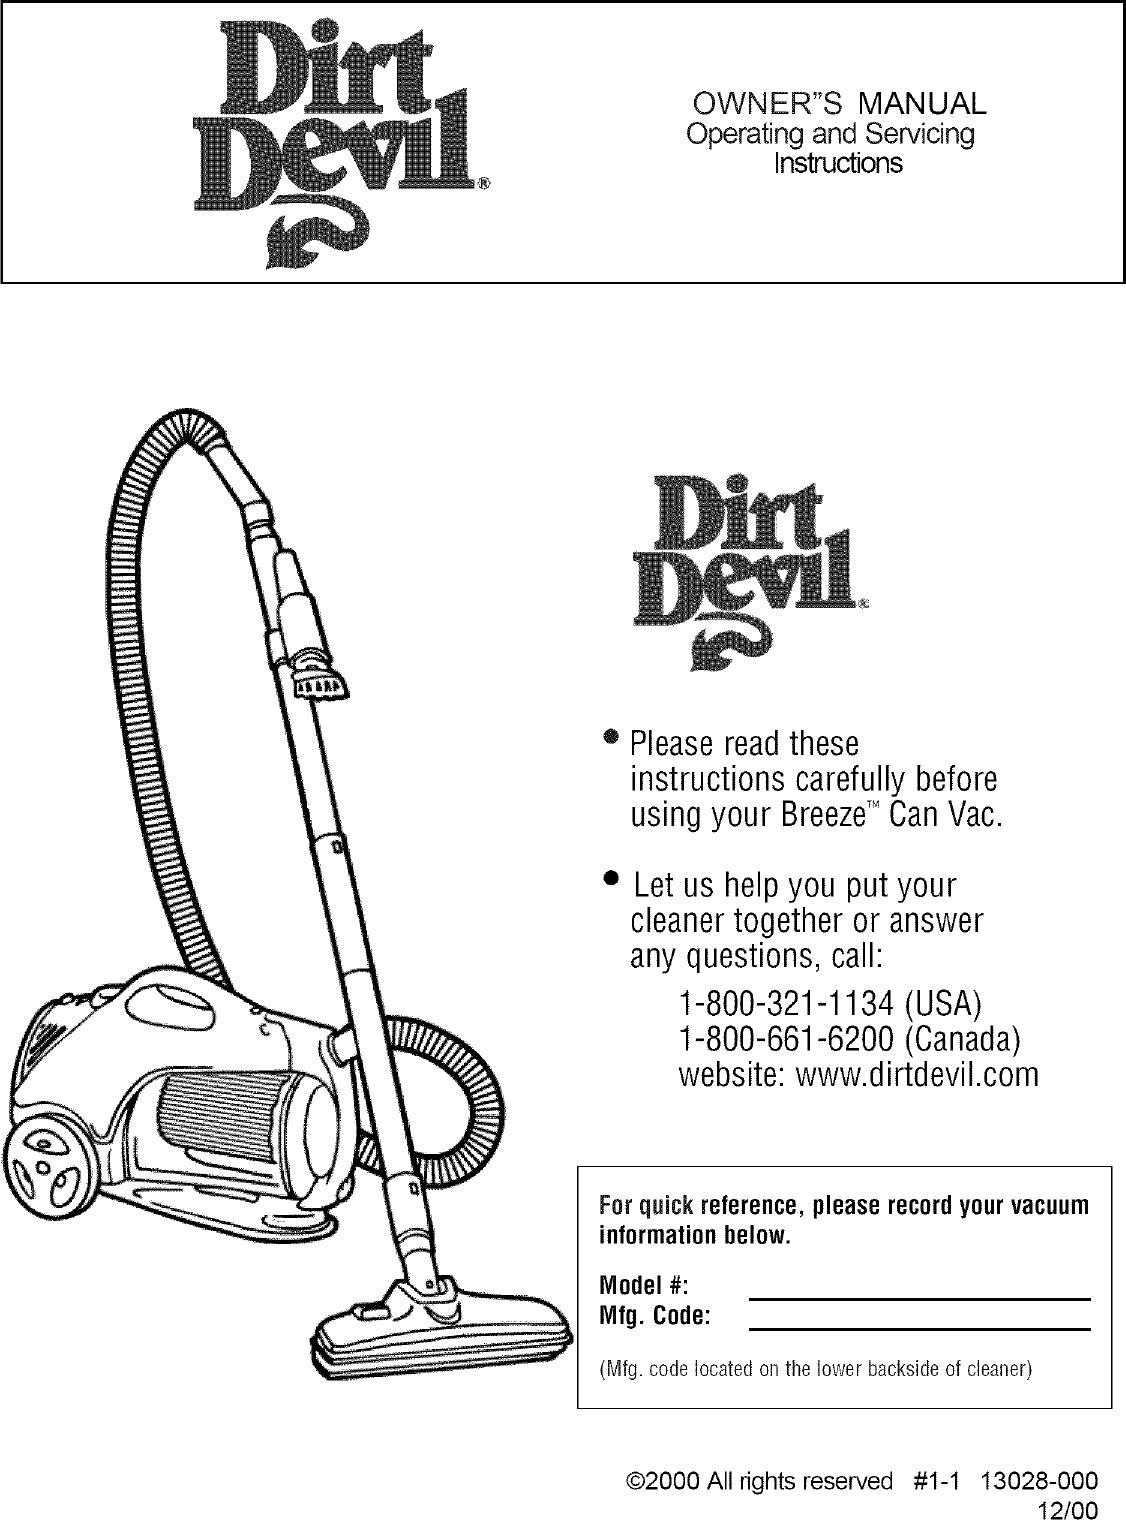 dirt devil 082500 user manual breeze vision manuals and guides l0406053 rh usermanual wiki Dirt Devil Bagless Upright Vacuum dirt devil user manual